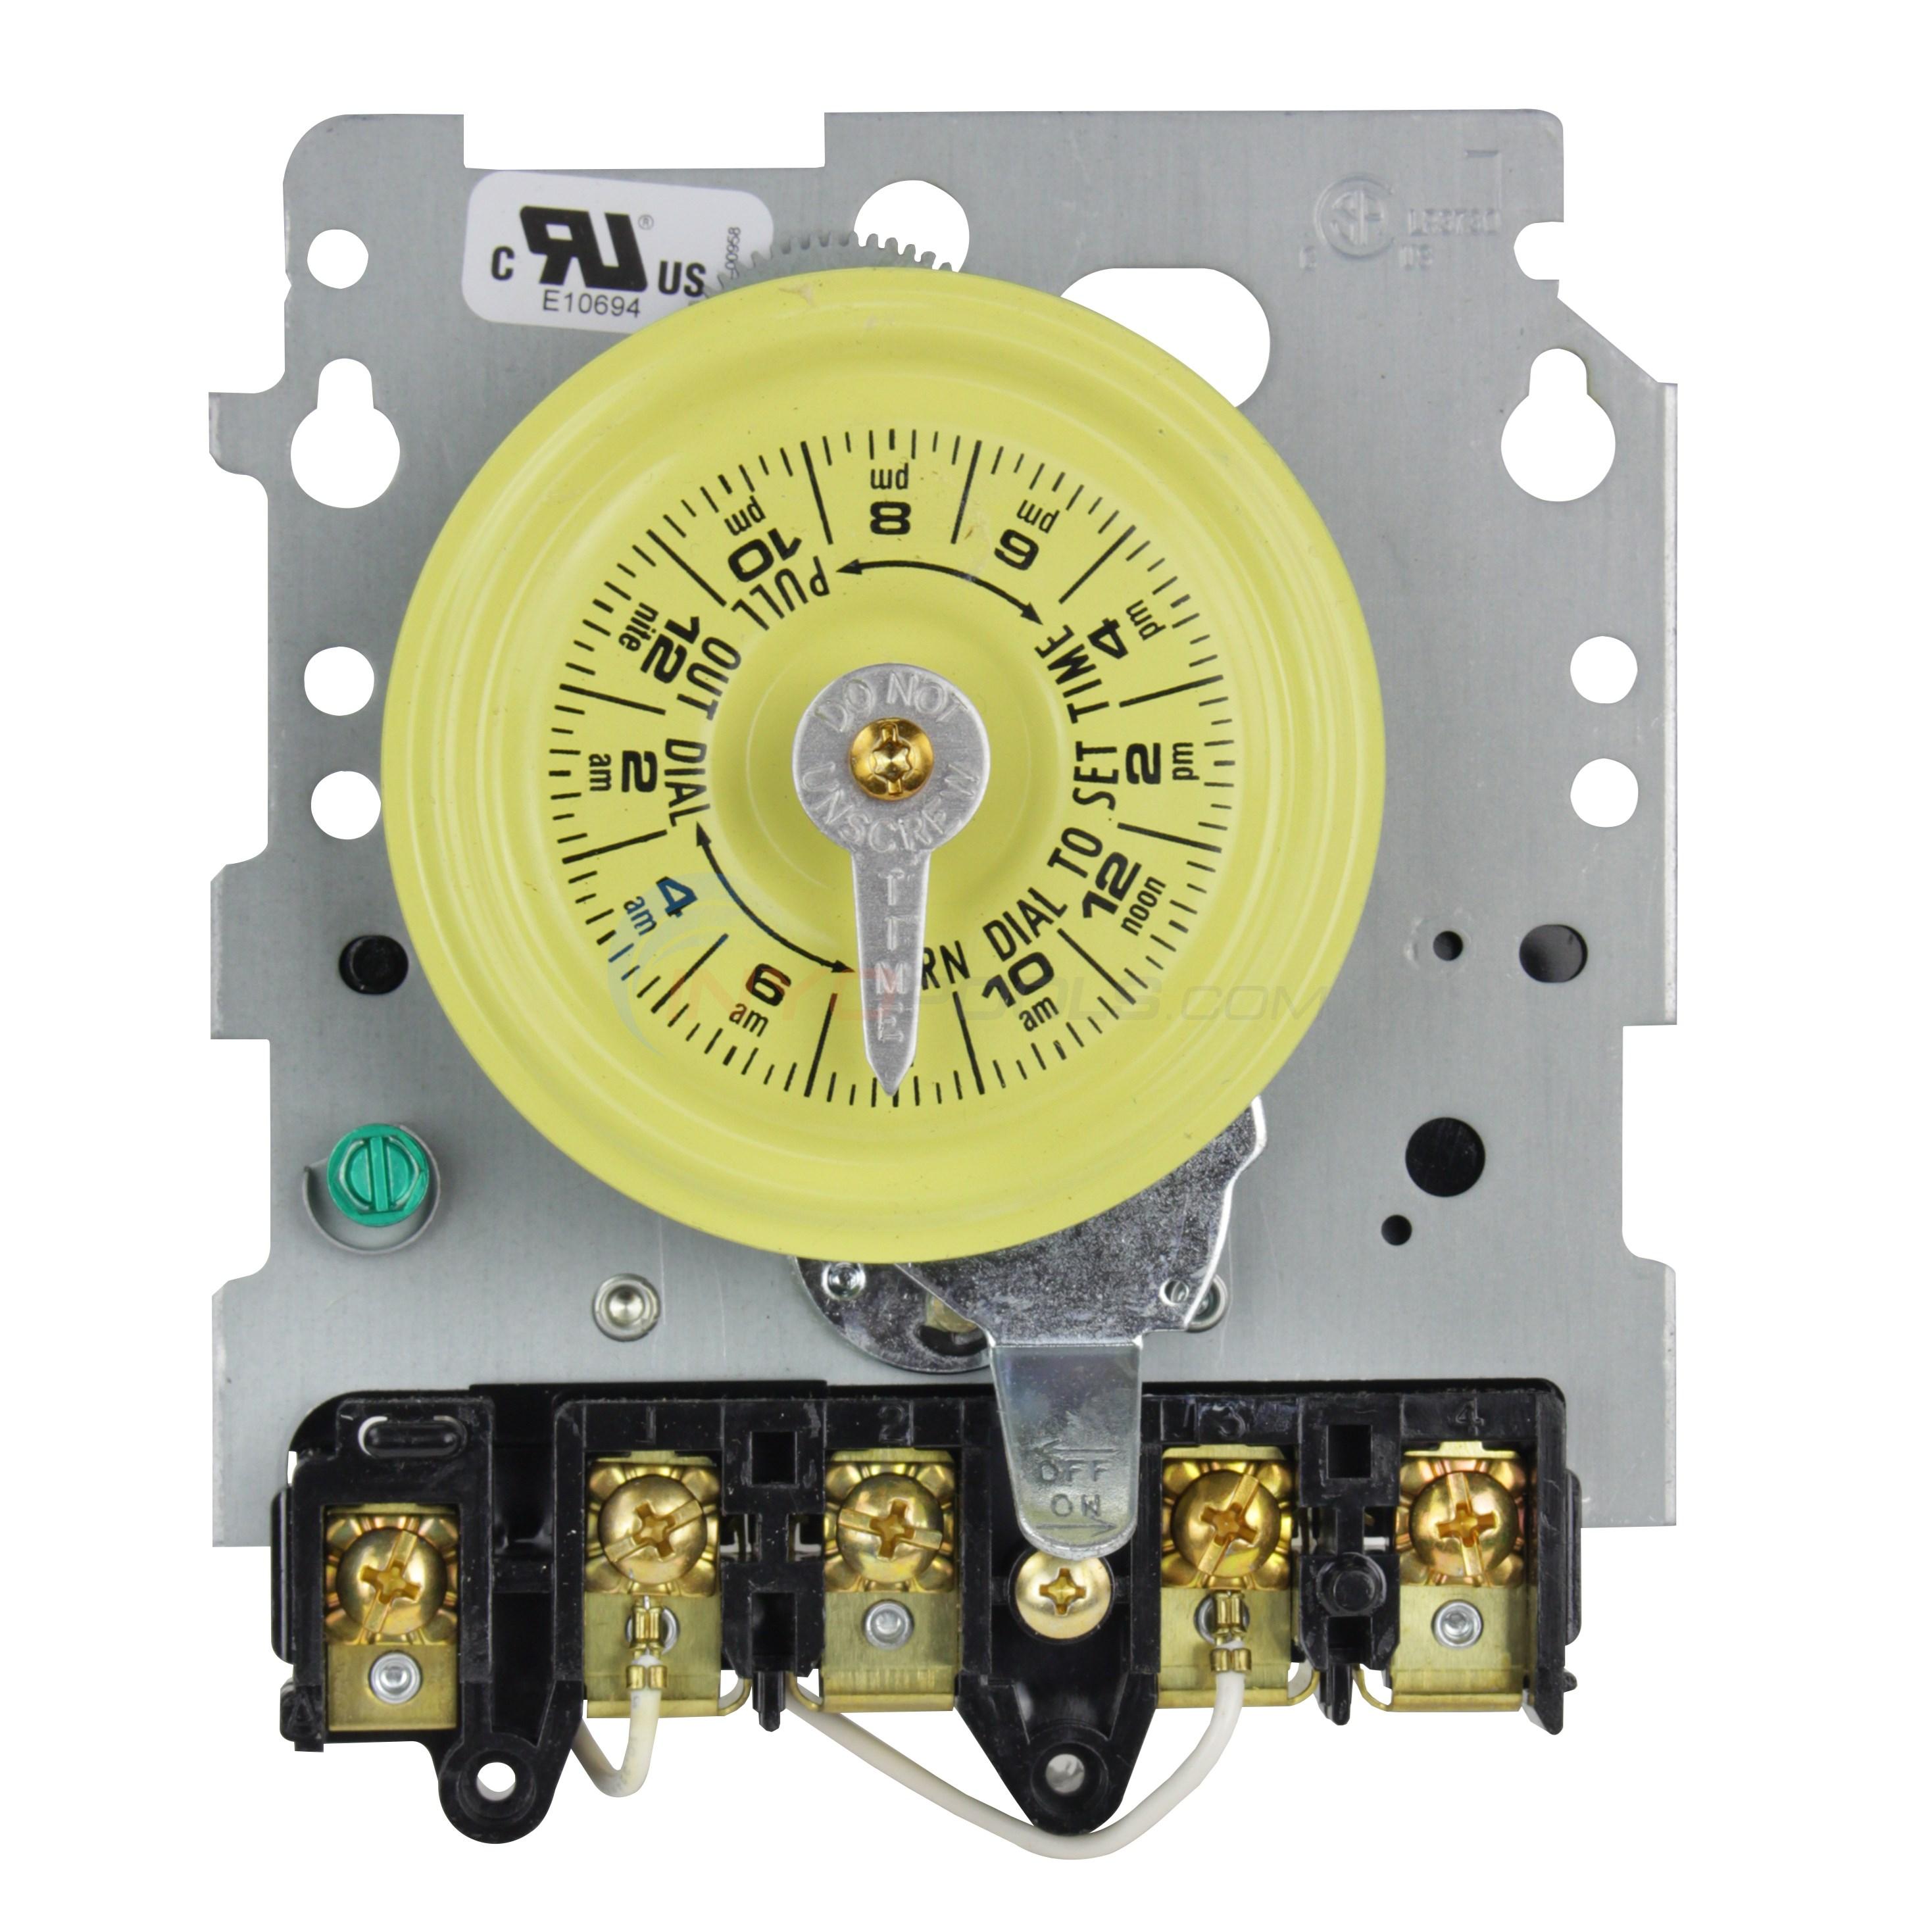 Intermatic E10694 Pool Timer Wiring Diagram Trusted Diagrams Wg1570 Data U2022 Installation